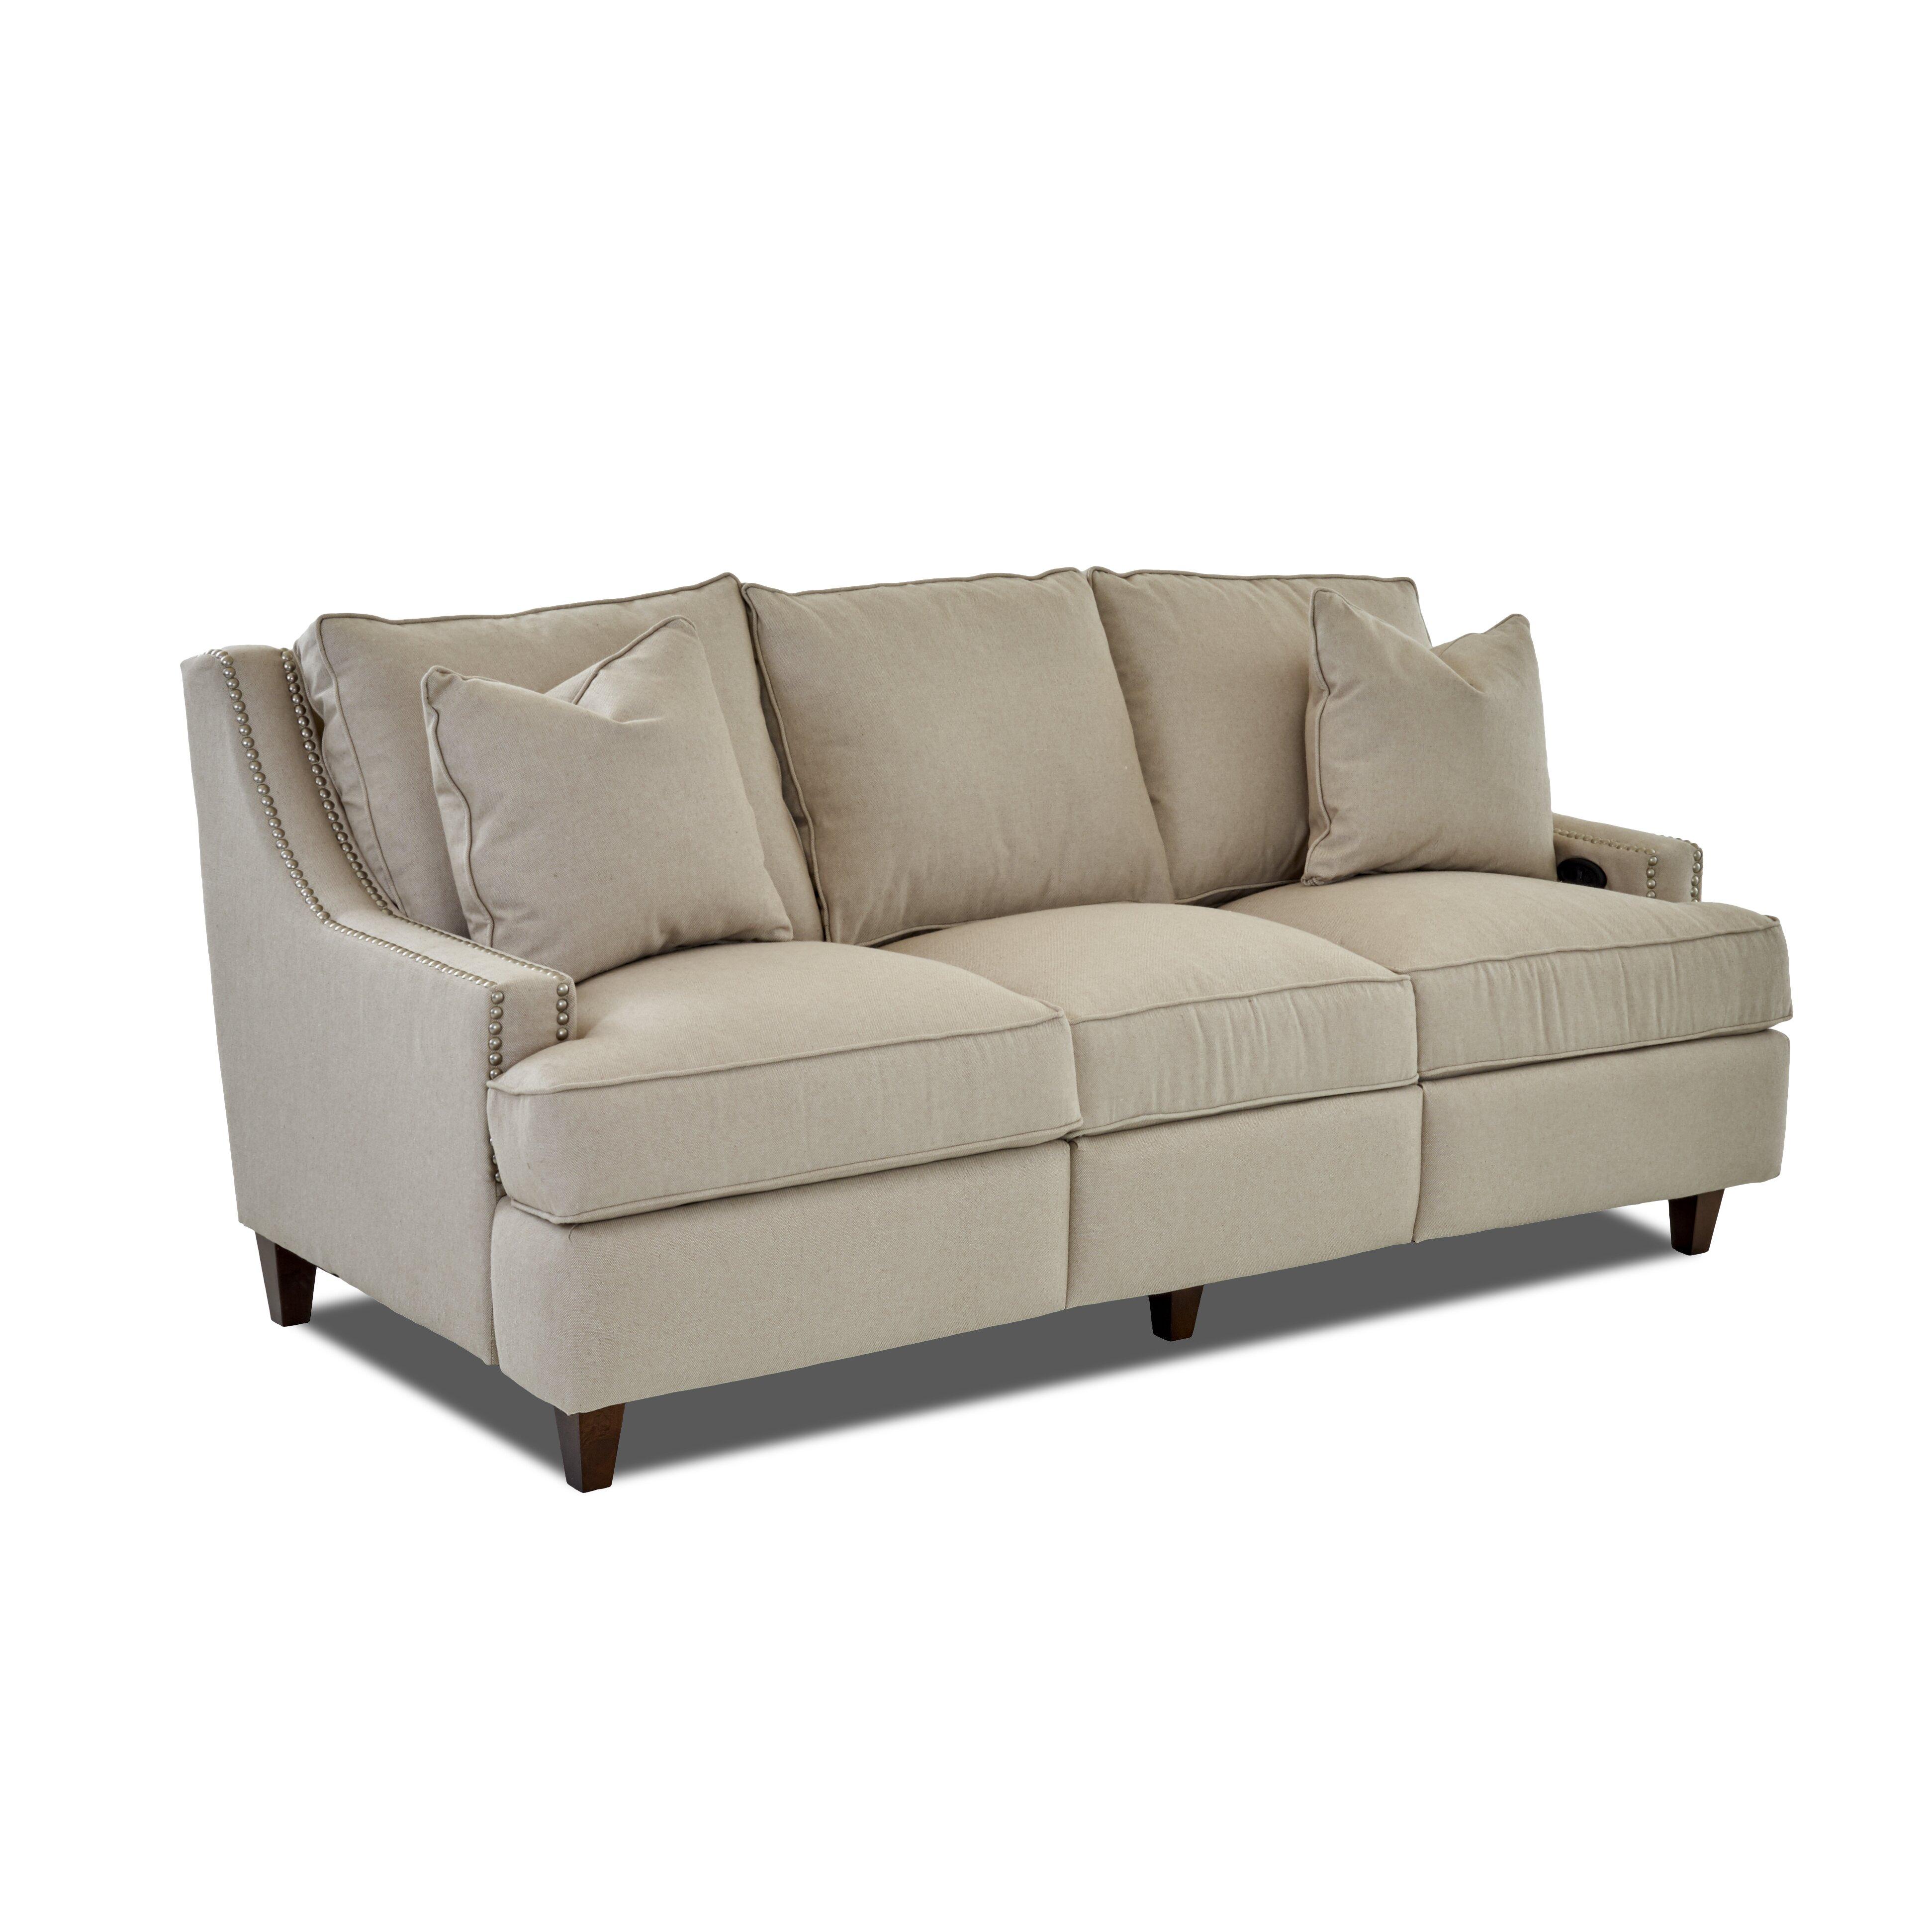 Wayfair Custom Upholstery Tricia Power Hybrid Reclining